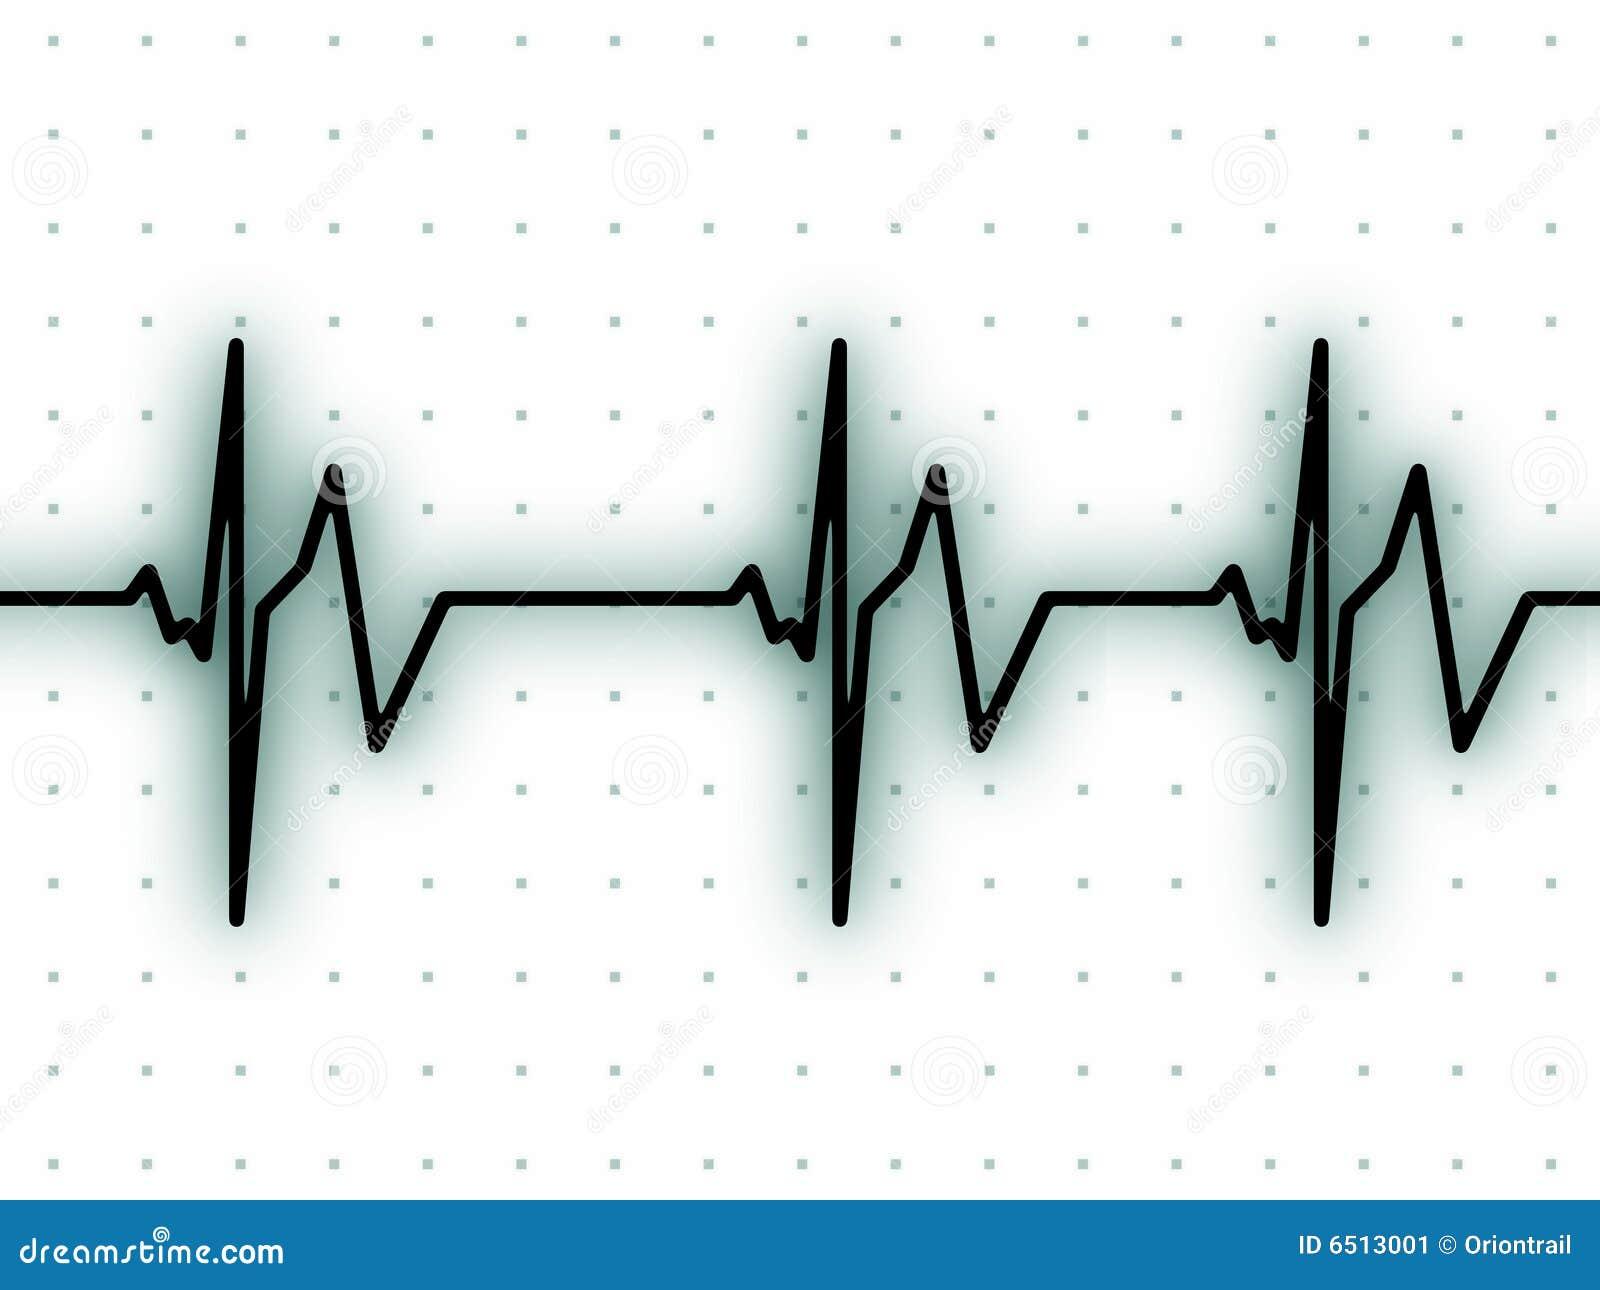 heart beat ecg screen 6513001